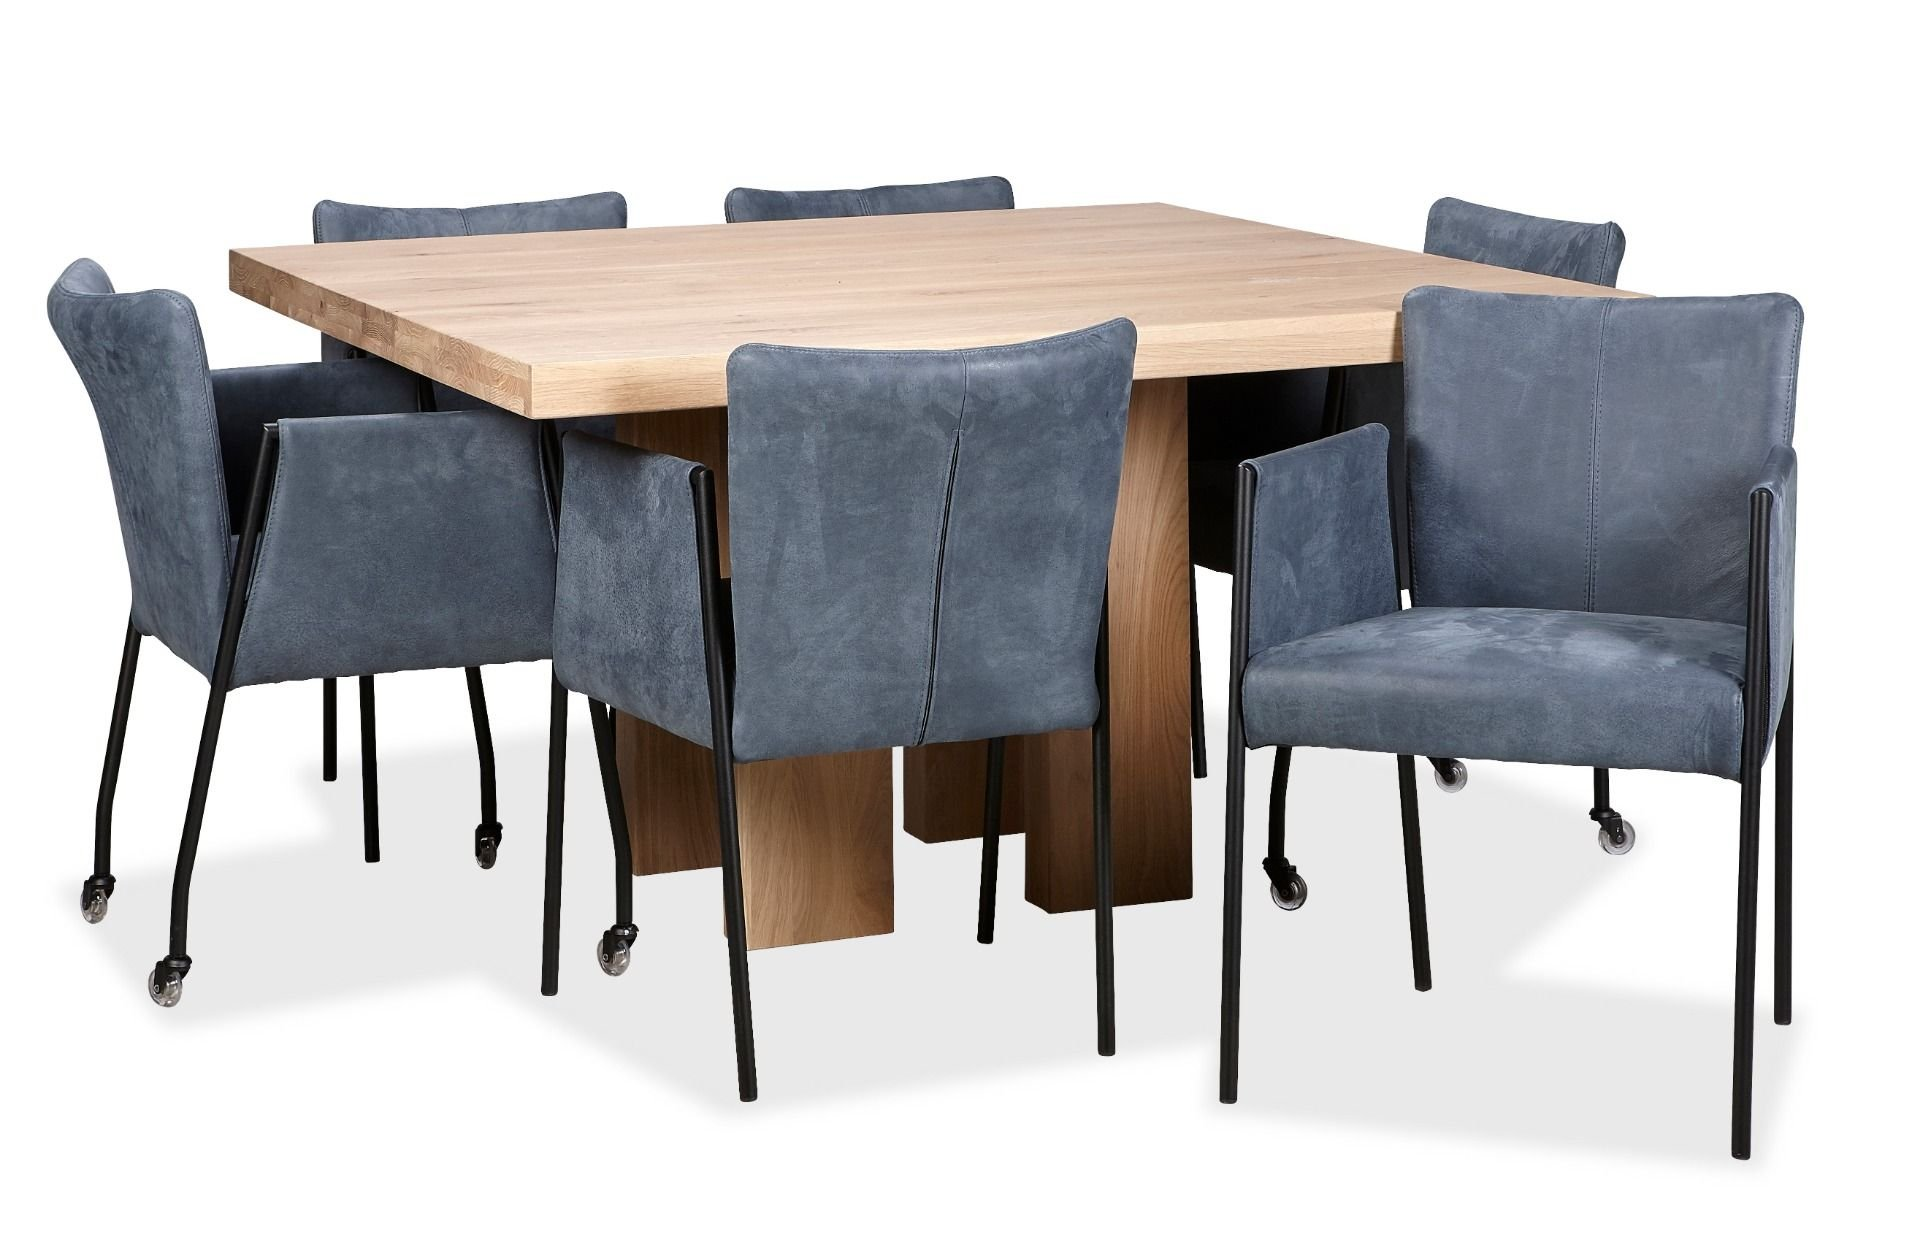 Design Vierkante Eettafel.De Beste Vierkante Ronde Of Smalle Eettafel Kiezen